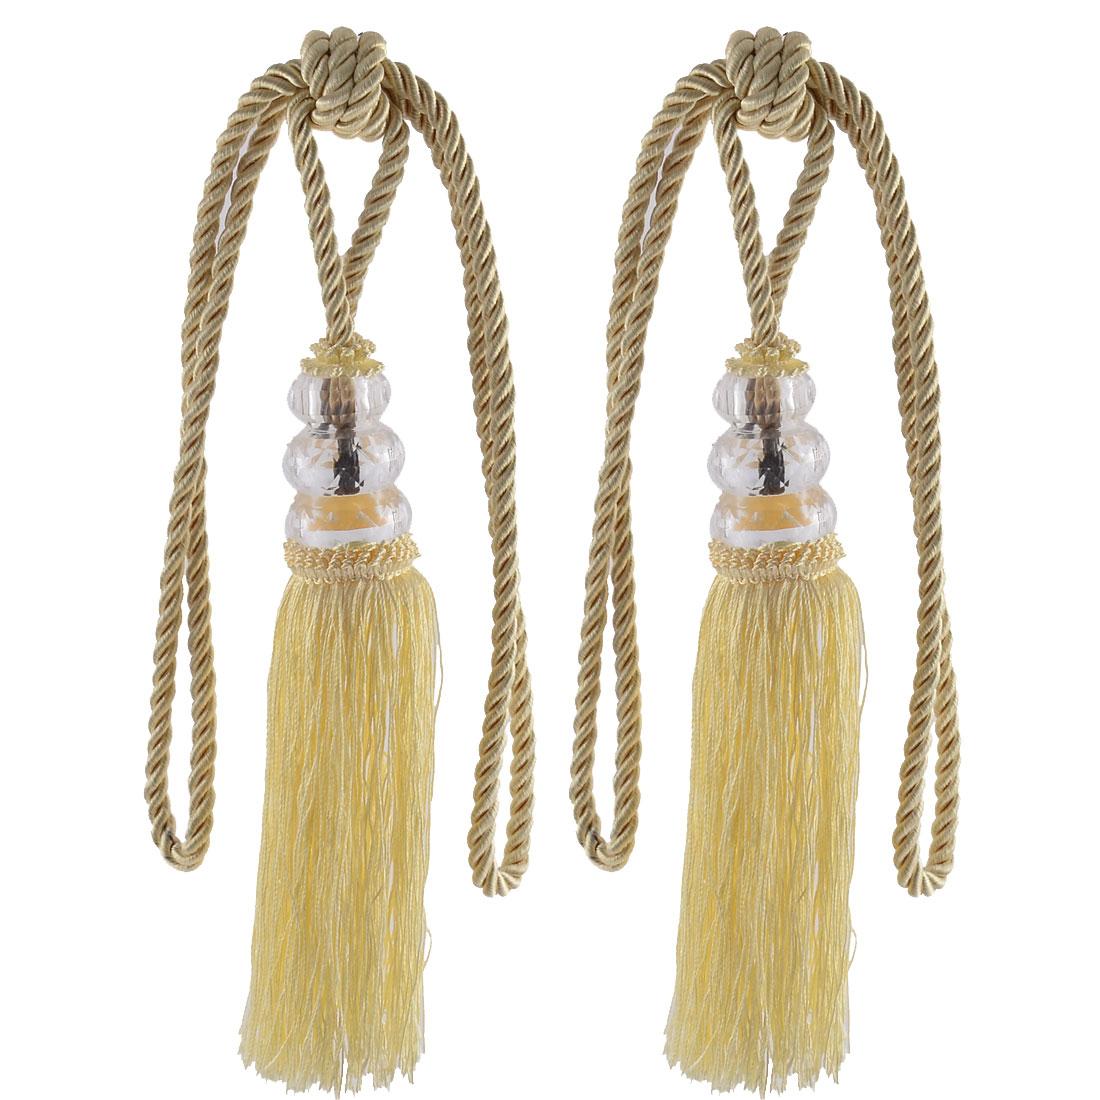 Home Plastic Bead Drapery Curtain Decoration Tassel Fringe Detail Tieback Rope Cord Yellow Pair